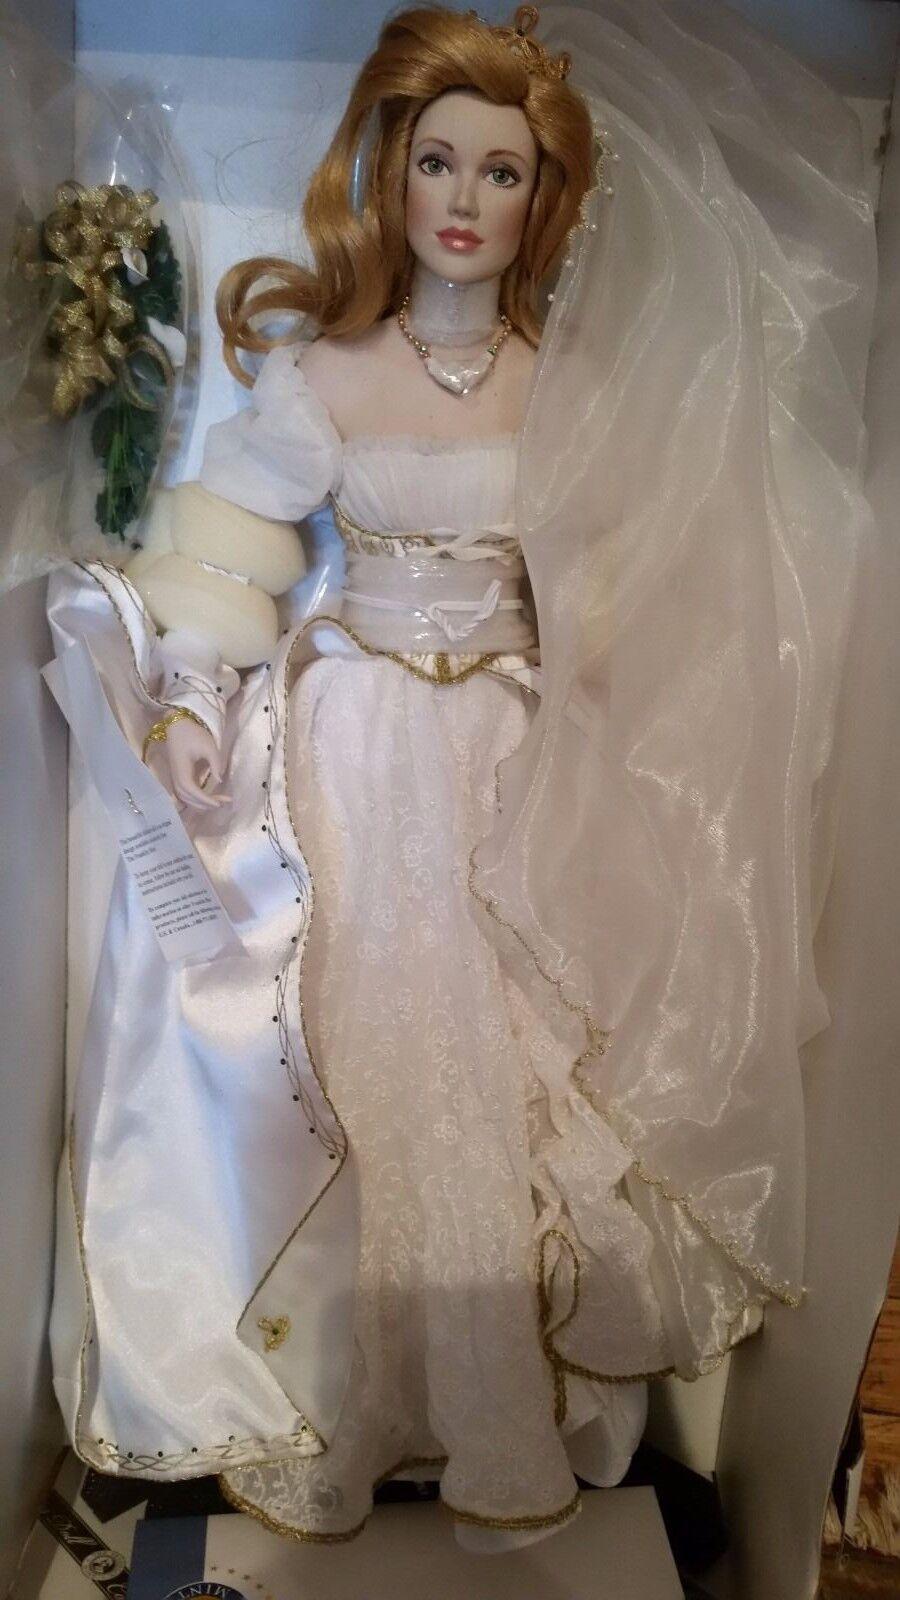 Franklin Mint Hermoso Colleen la novia irlandesa Nueva Muñeca de porcelana Limitado Raro